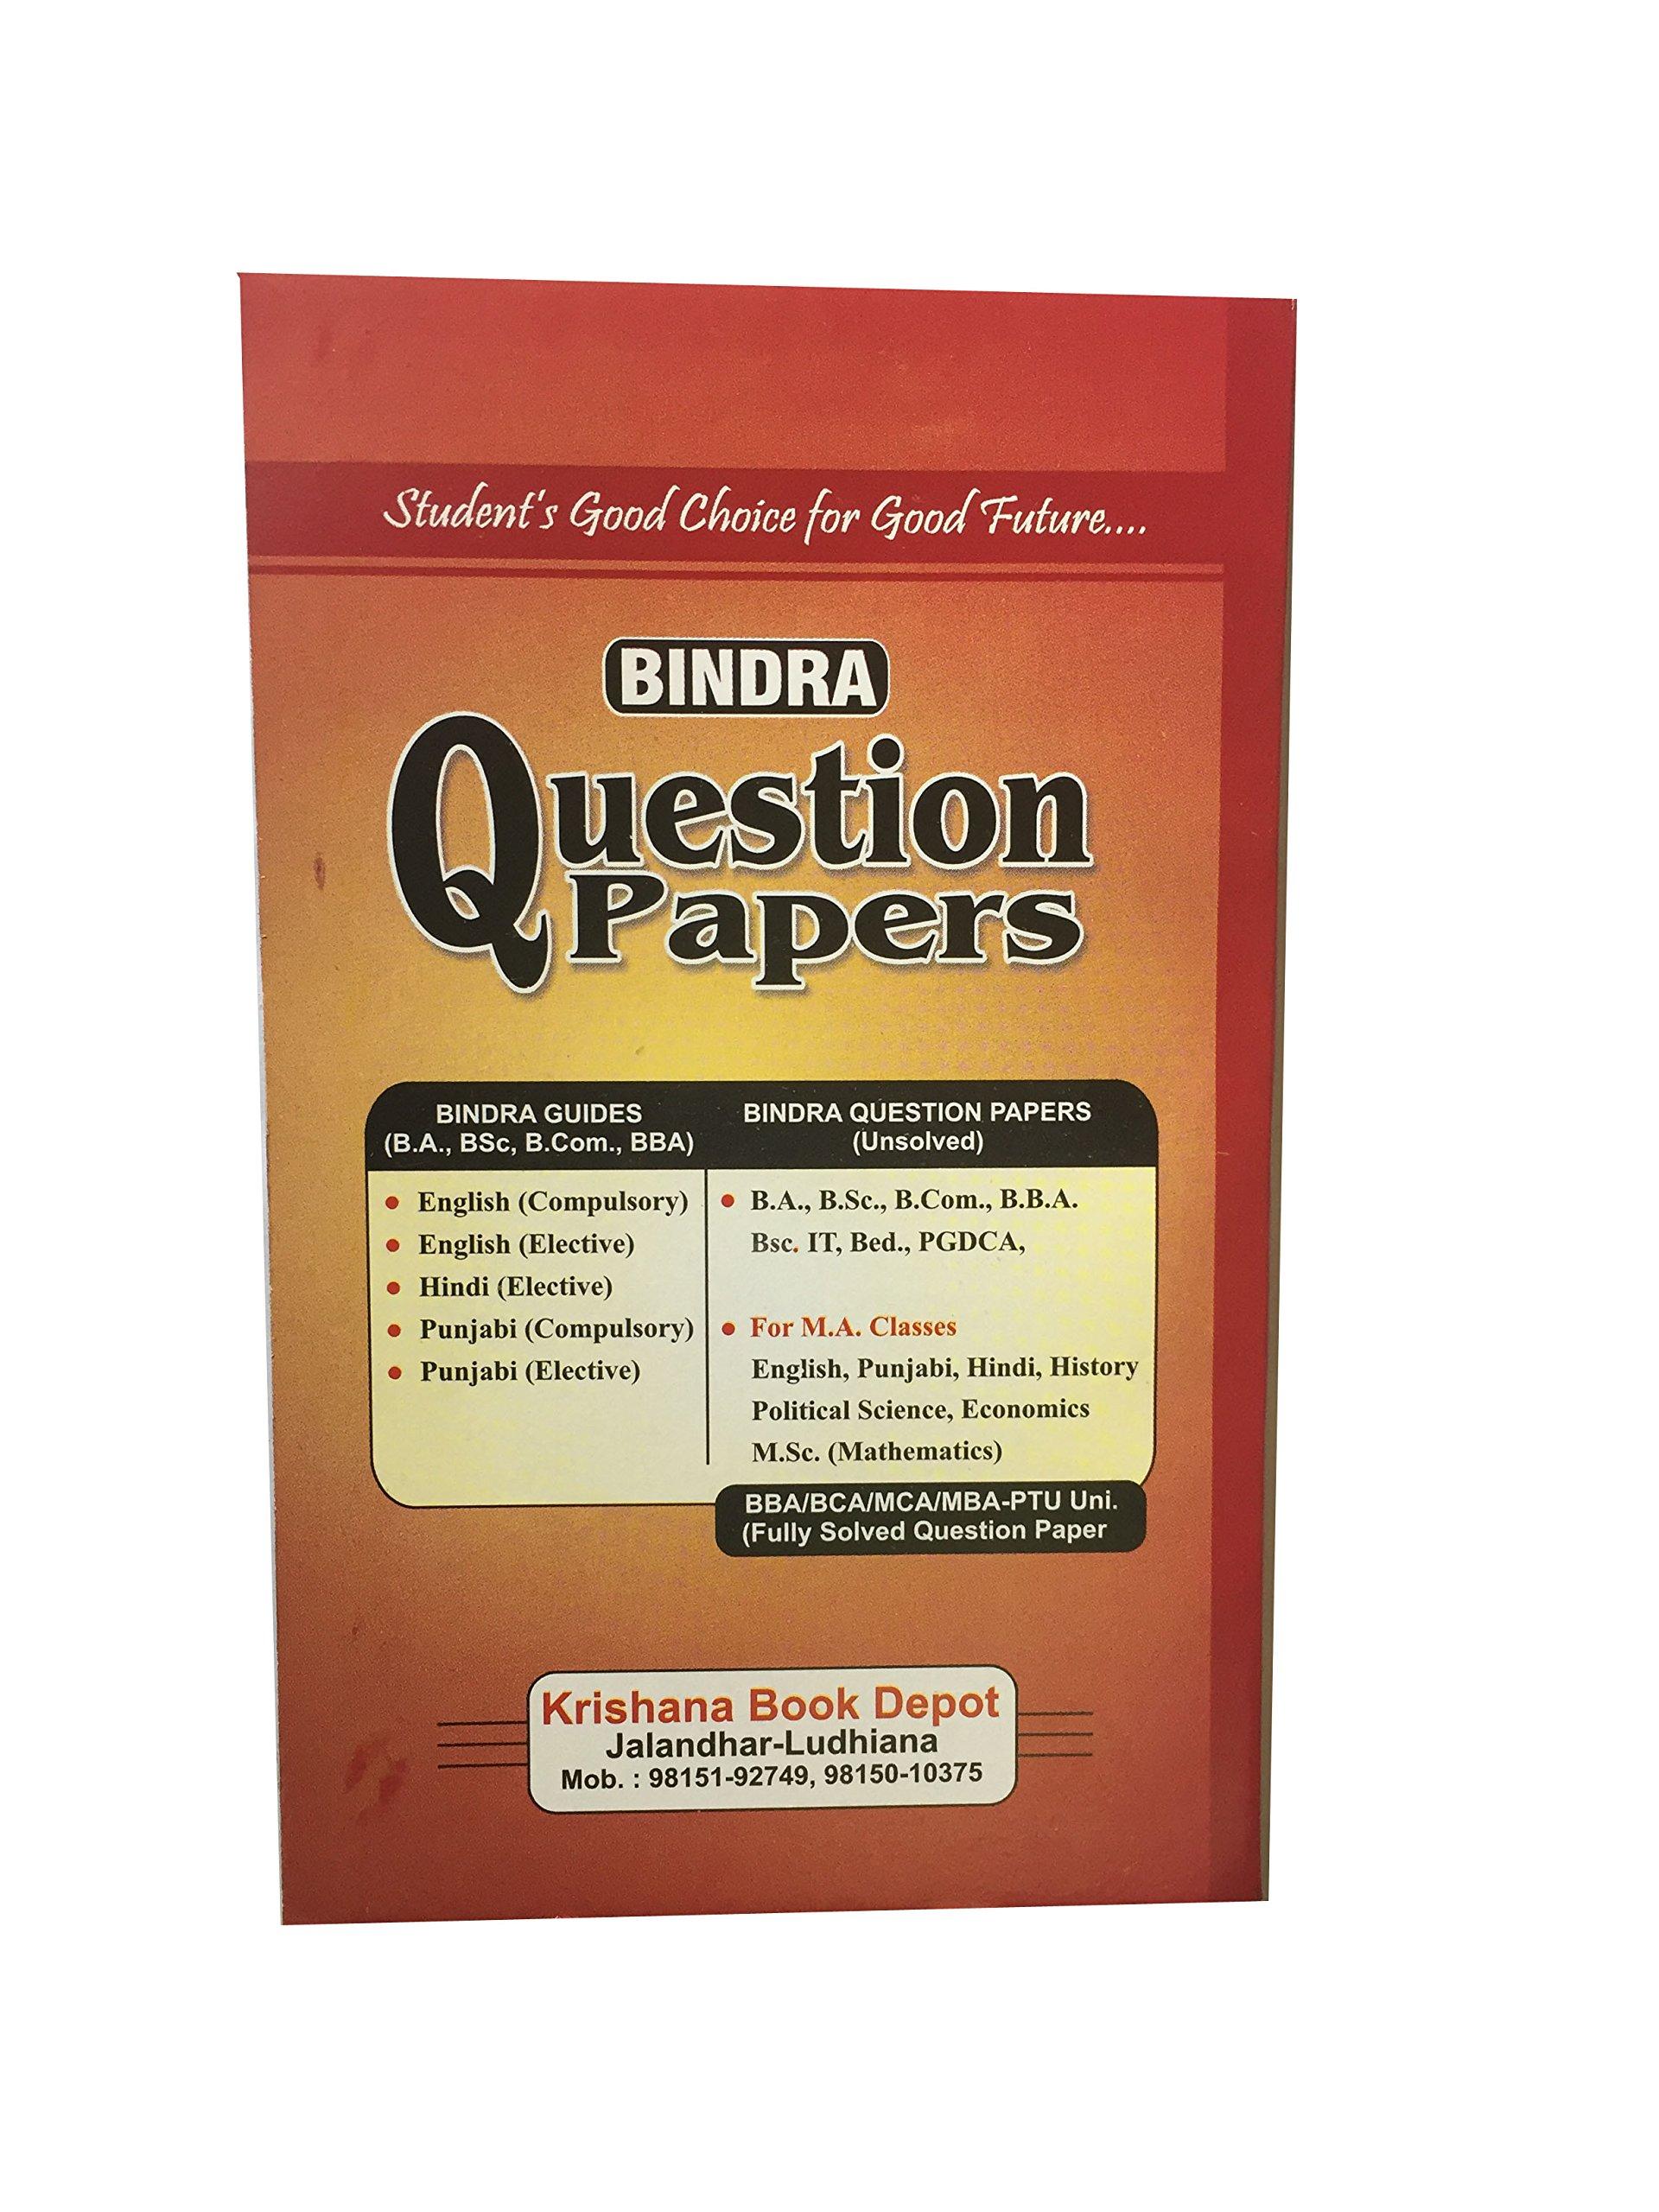 Buy Bindra 10 years Question Papers B Sc-2, G N D U Book